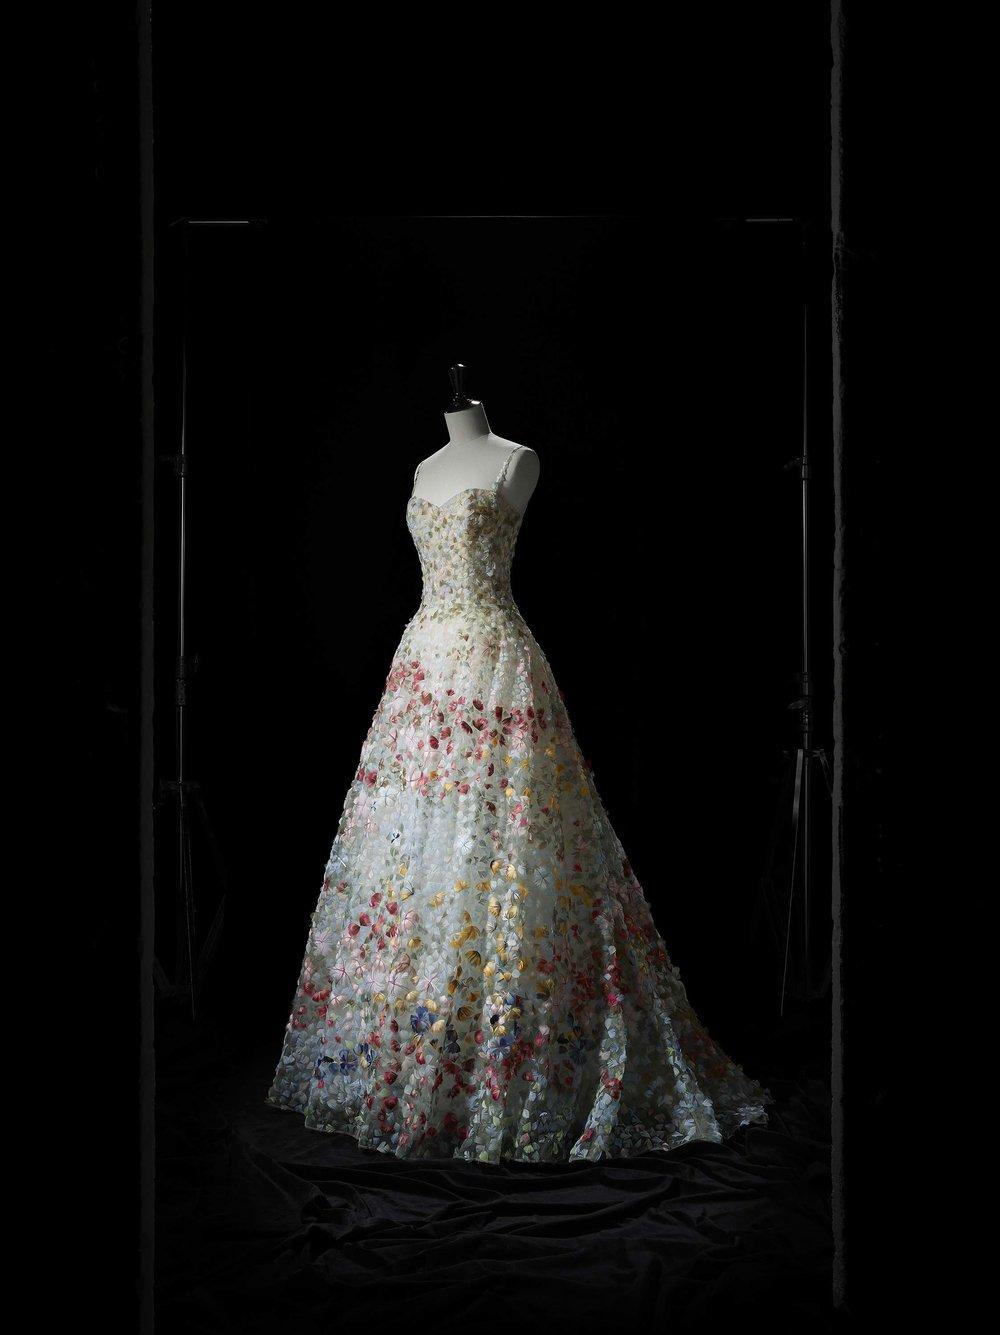 Jardin fleuri bustier dress, Spring-Summer 2017 Haute Couture collection. Christian Dior by Maria Grazia Chiuri. Dior Héritage collection, Paris. Photo © Laziz Hamani.jpg